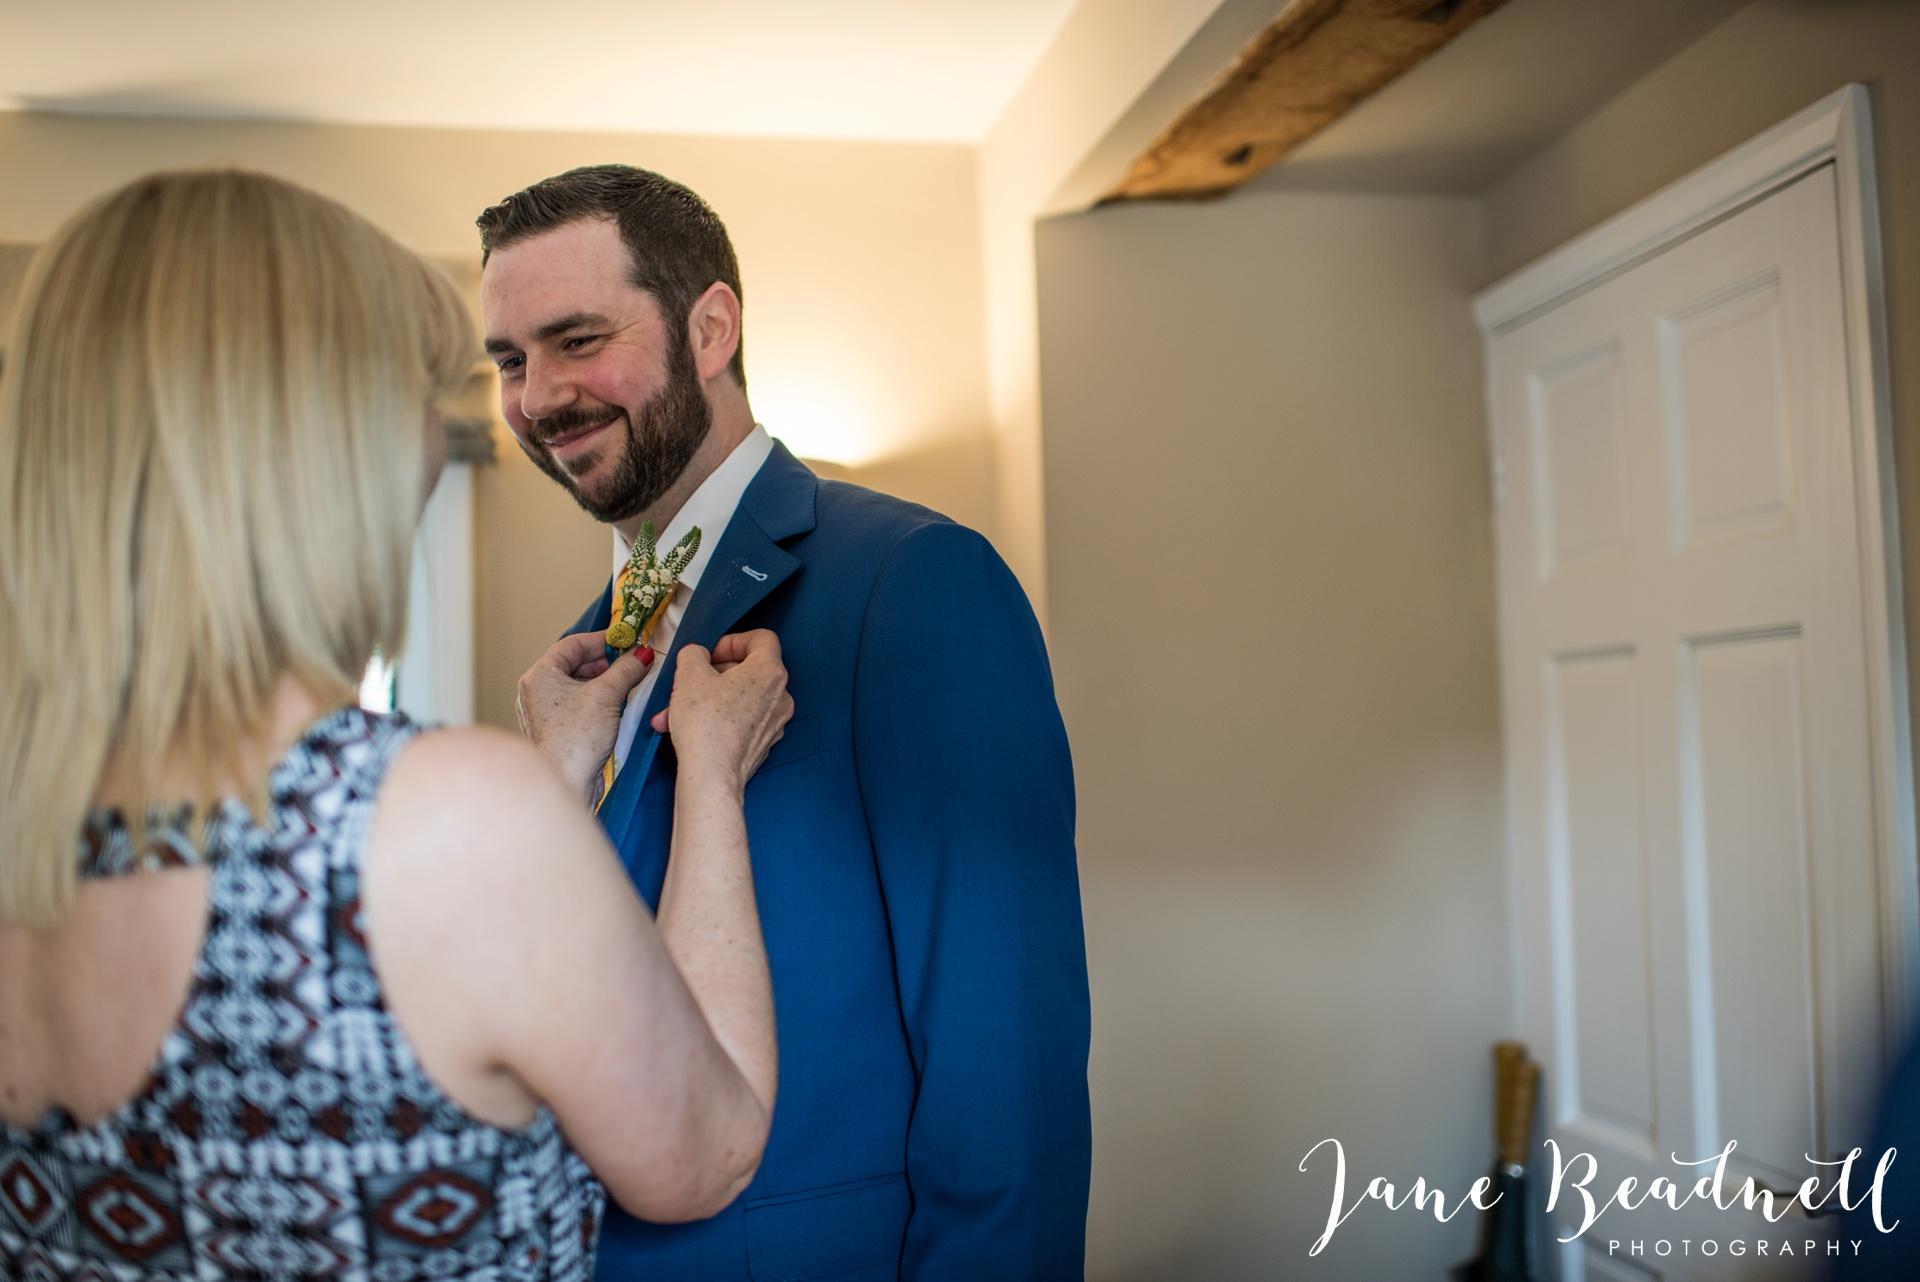 South Farm Wedding photography Hertfordshire by Jane Beadnell Photography fine art wedding photographer_0040